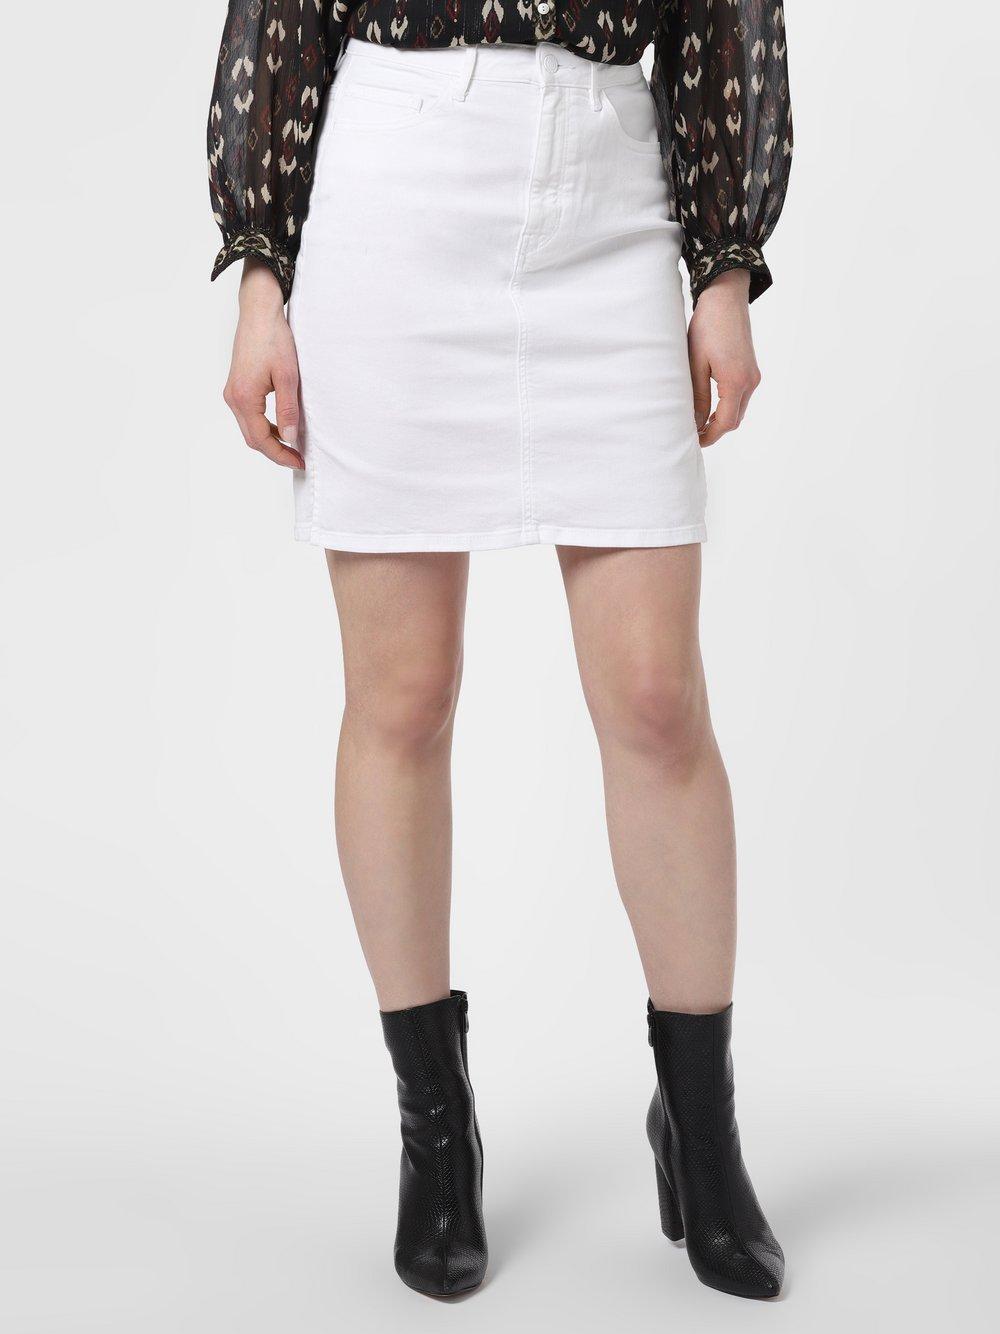 BOSS Casual – Jeansowa spódnica damska – J90 Elgin, biały Van Graaf 461093-0001-00310